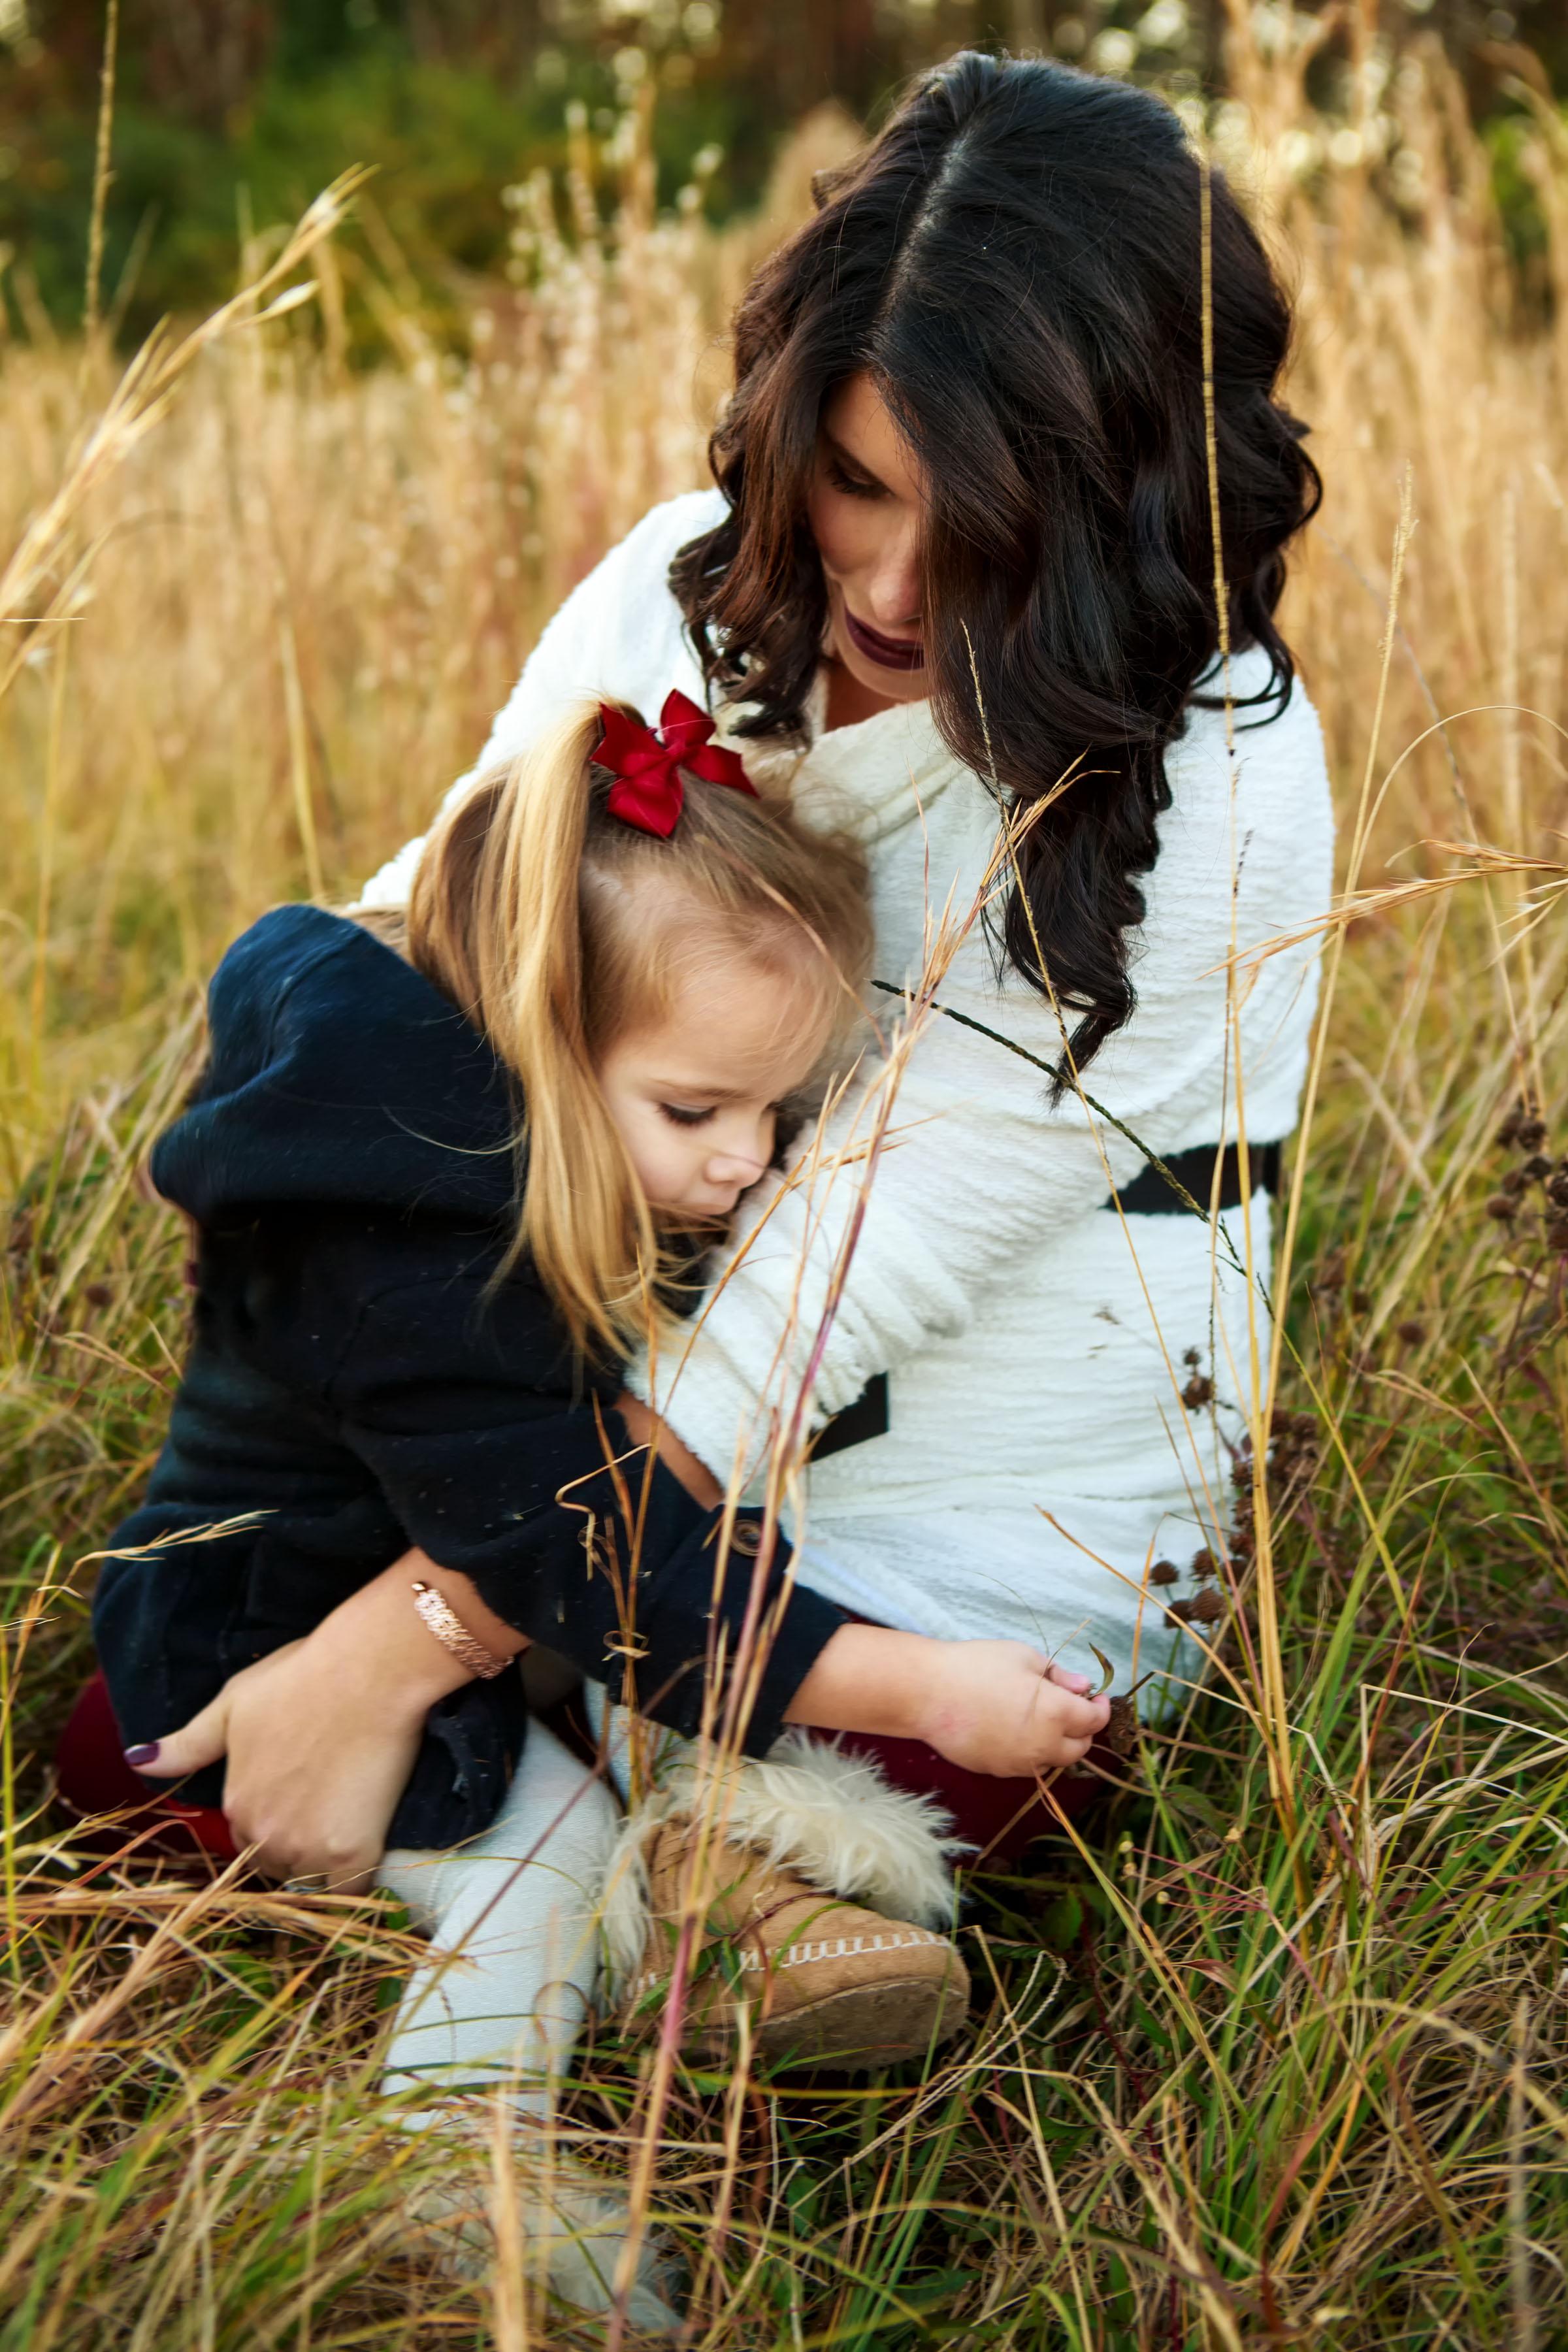 NC_Maternity_Photographer_Tiffany_Abruzzo_Photography_15.jpg